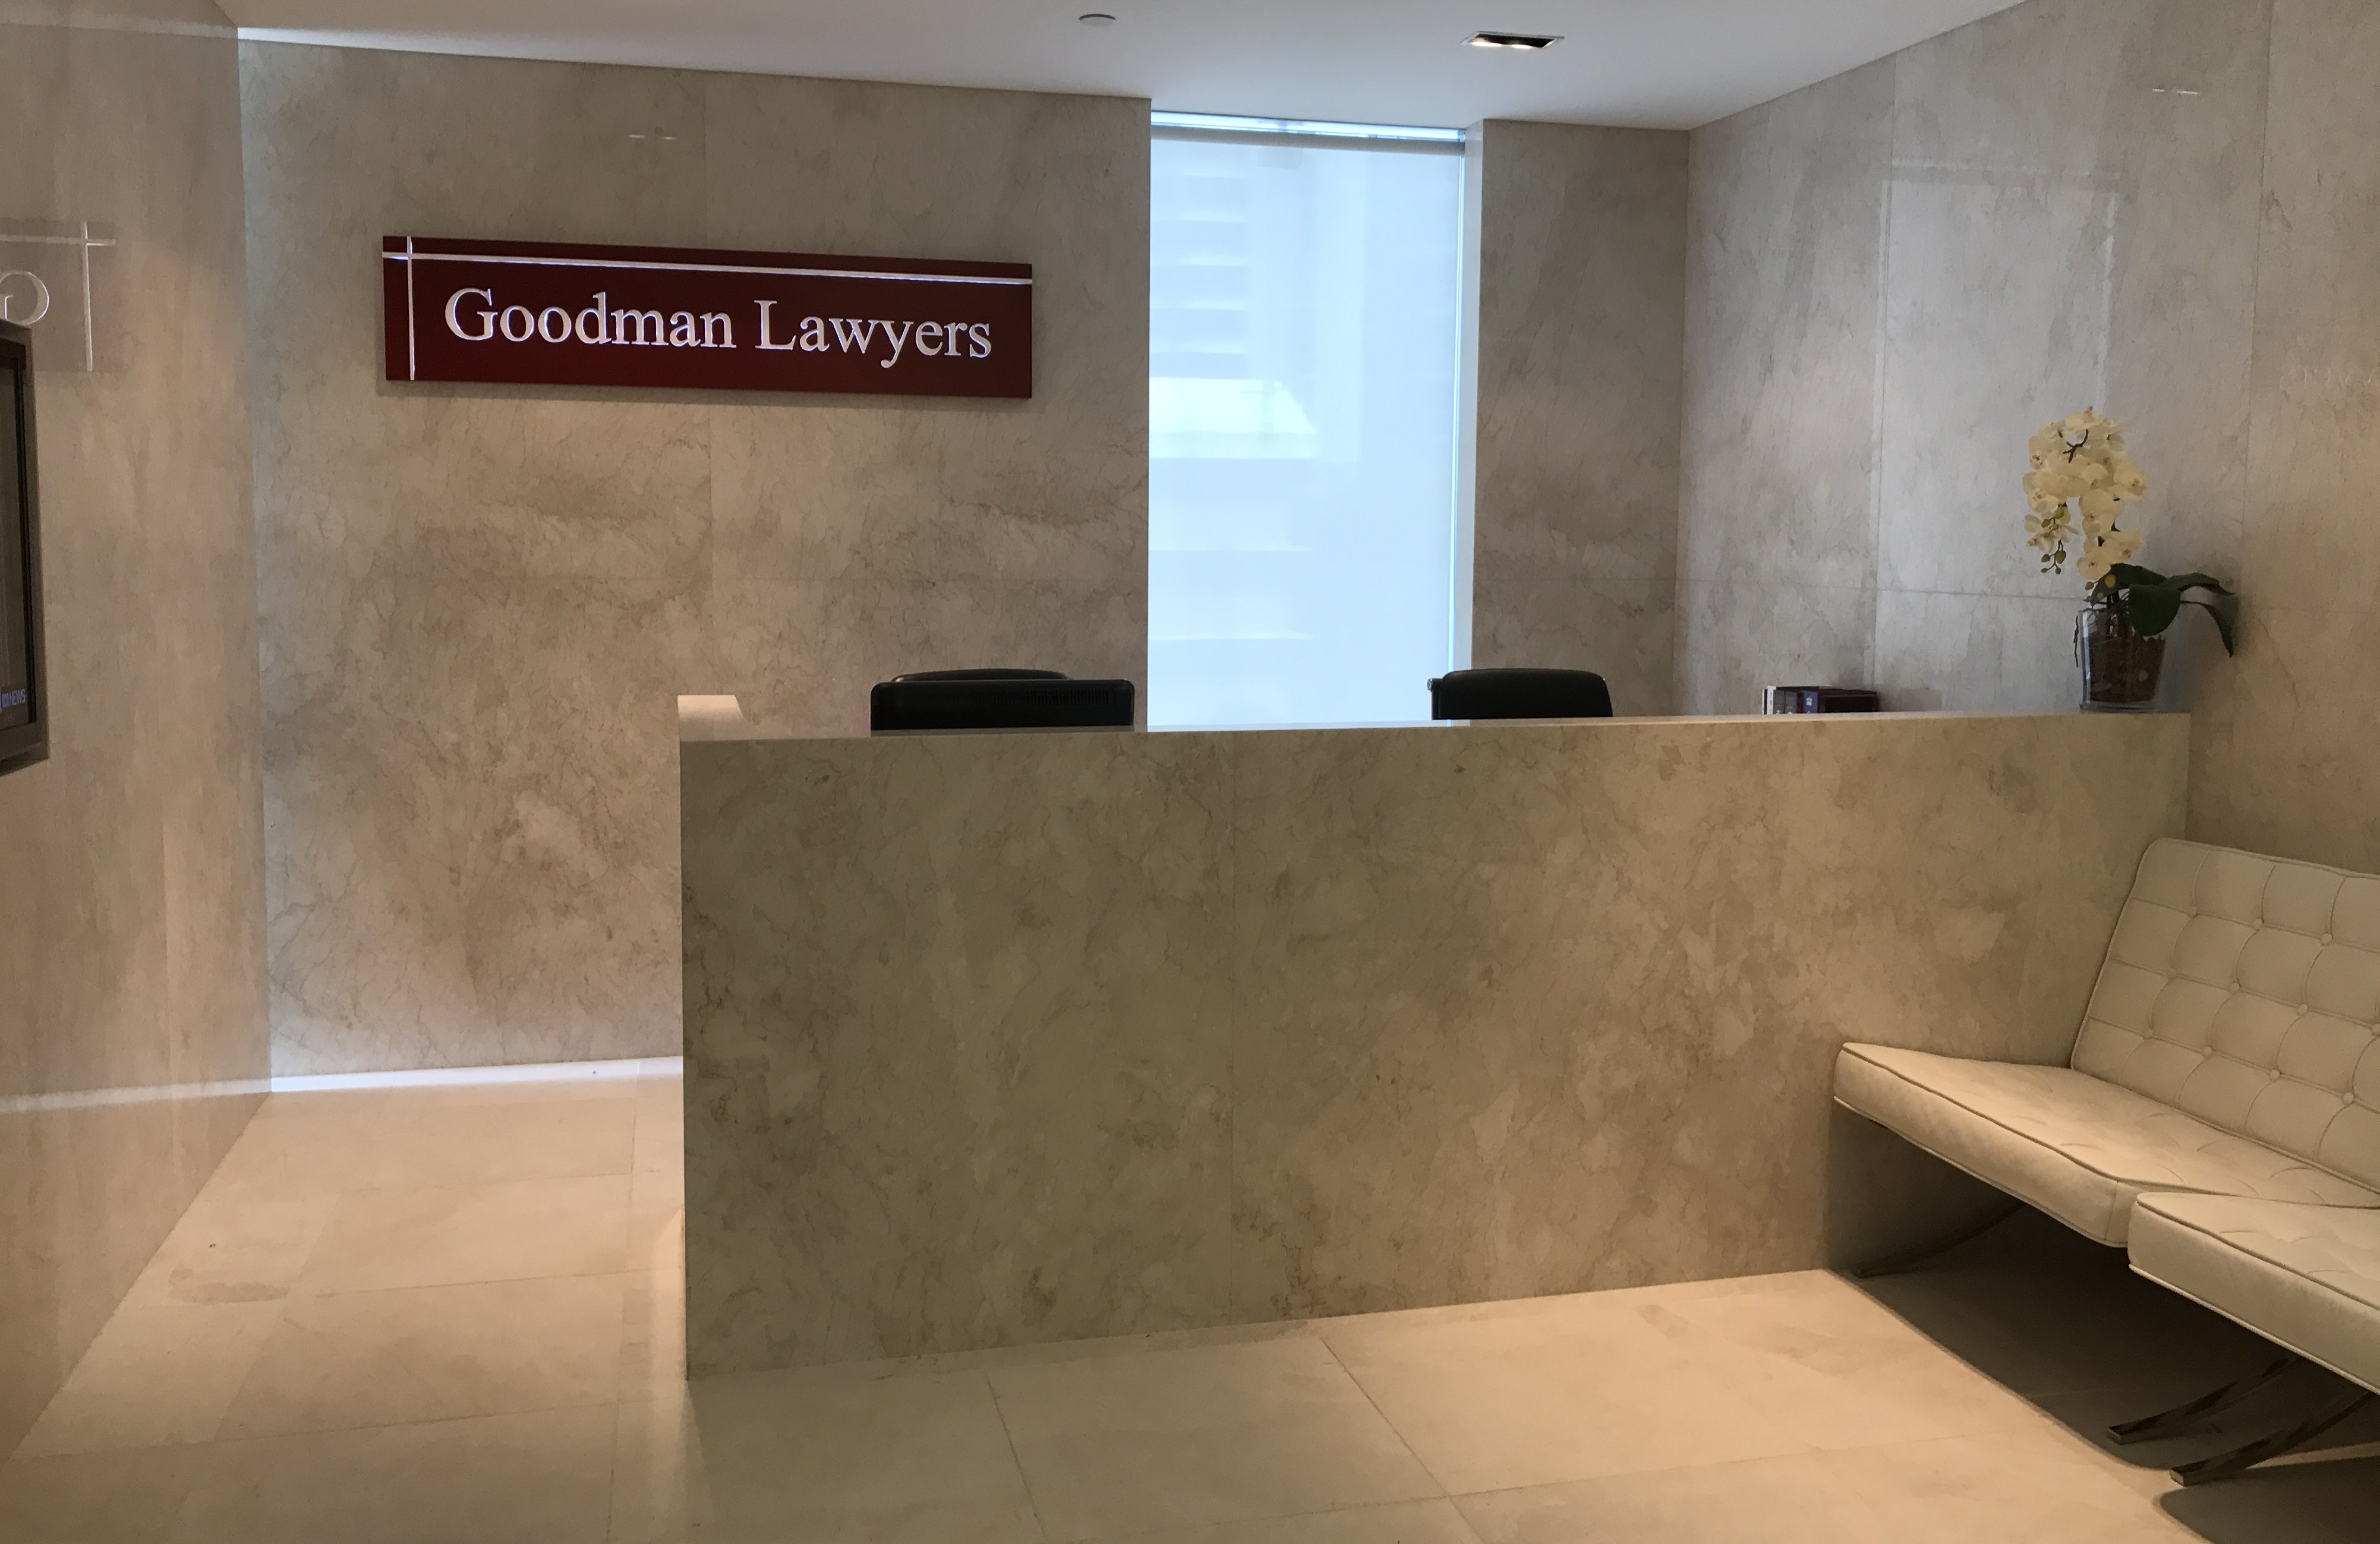 Goodman Lawyers Brisbane CBD Commercial Business Law